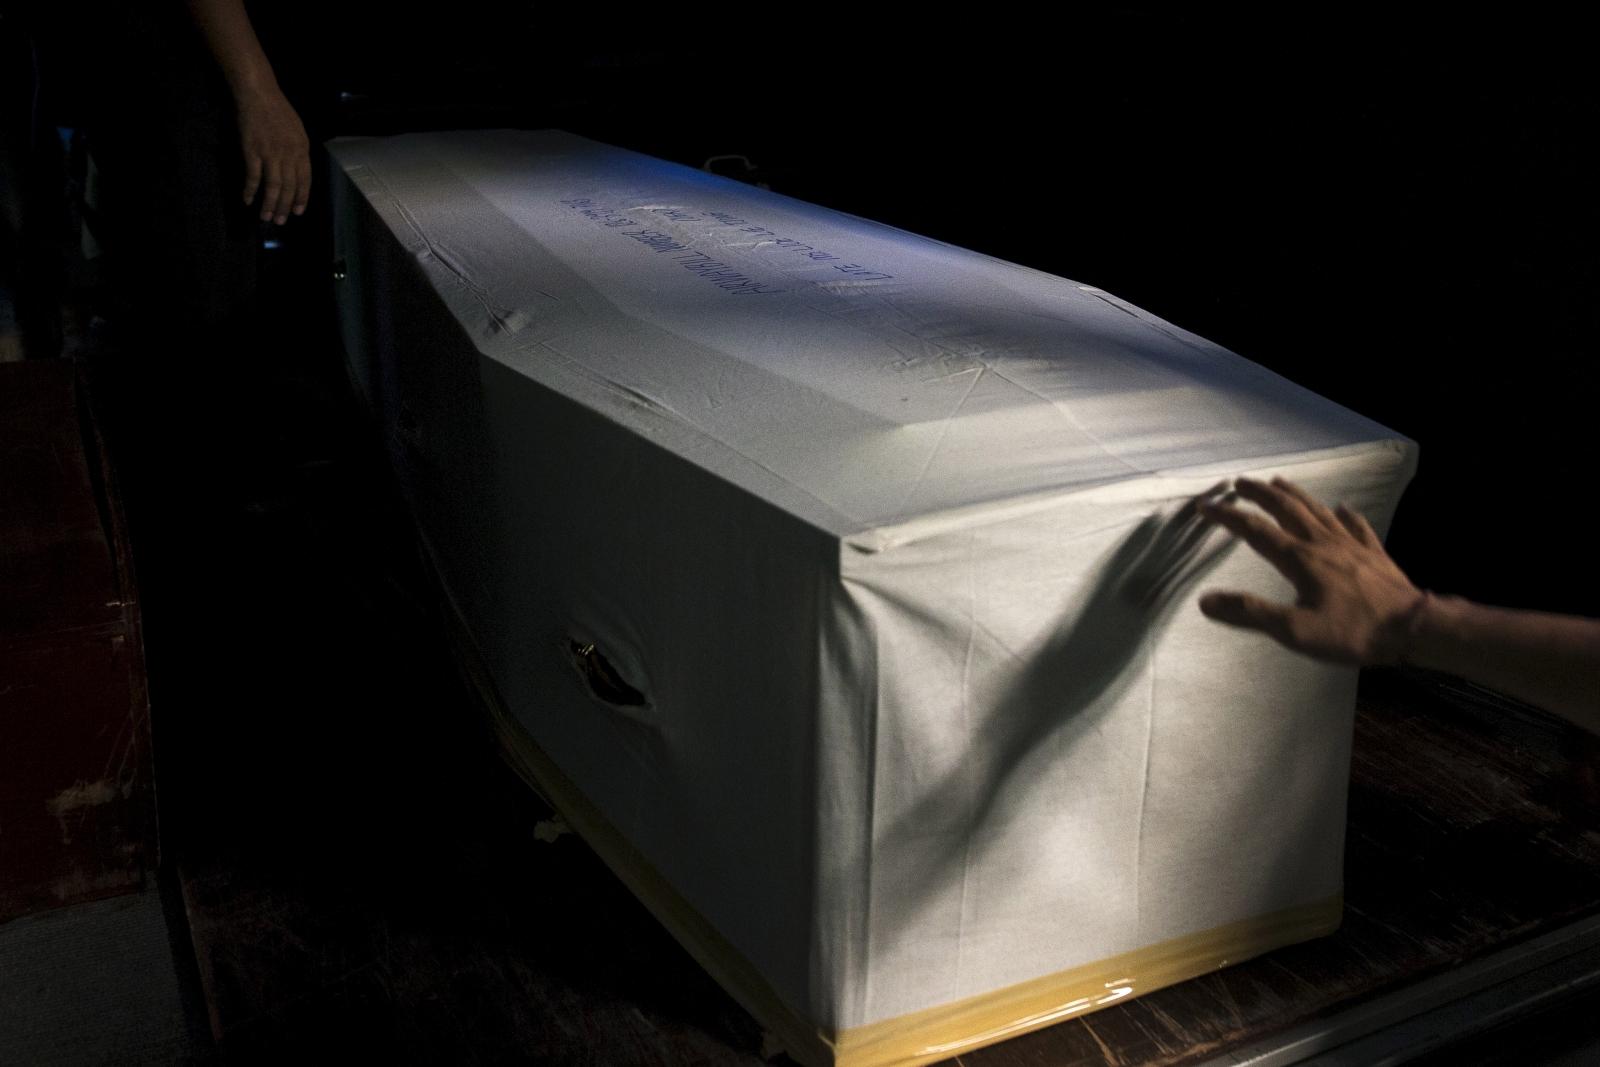 Father buries wrong man